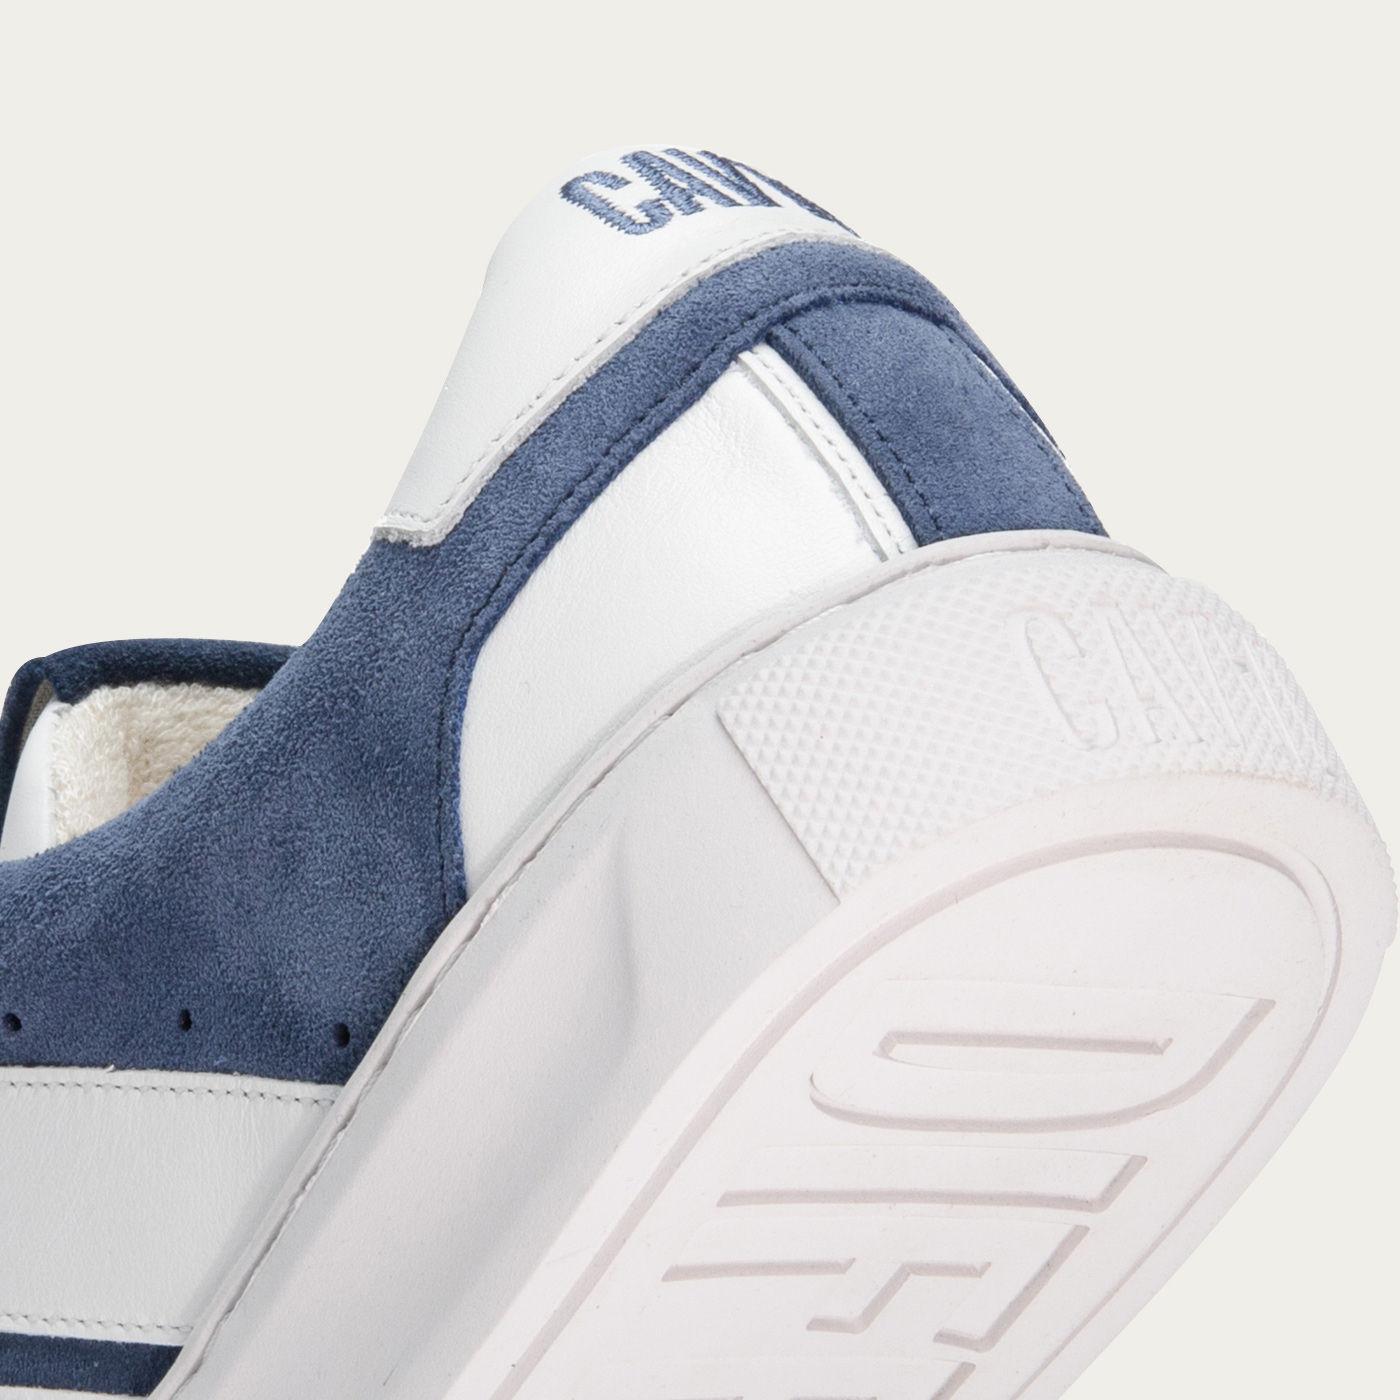 Divine Night Slash Sneakers   Bombinate